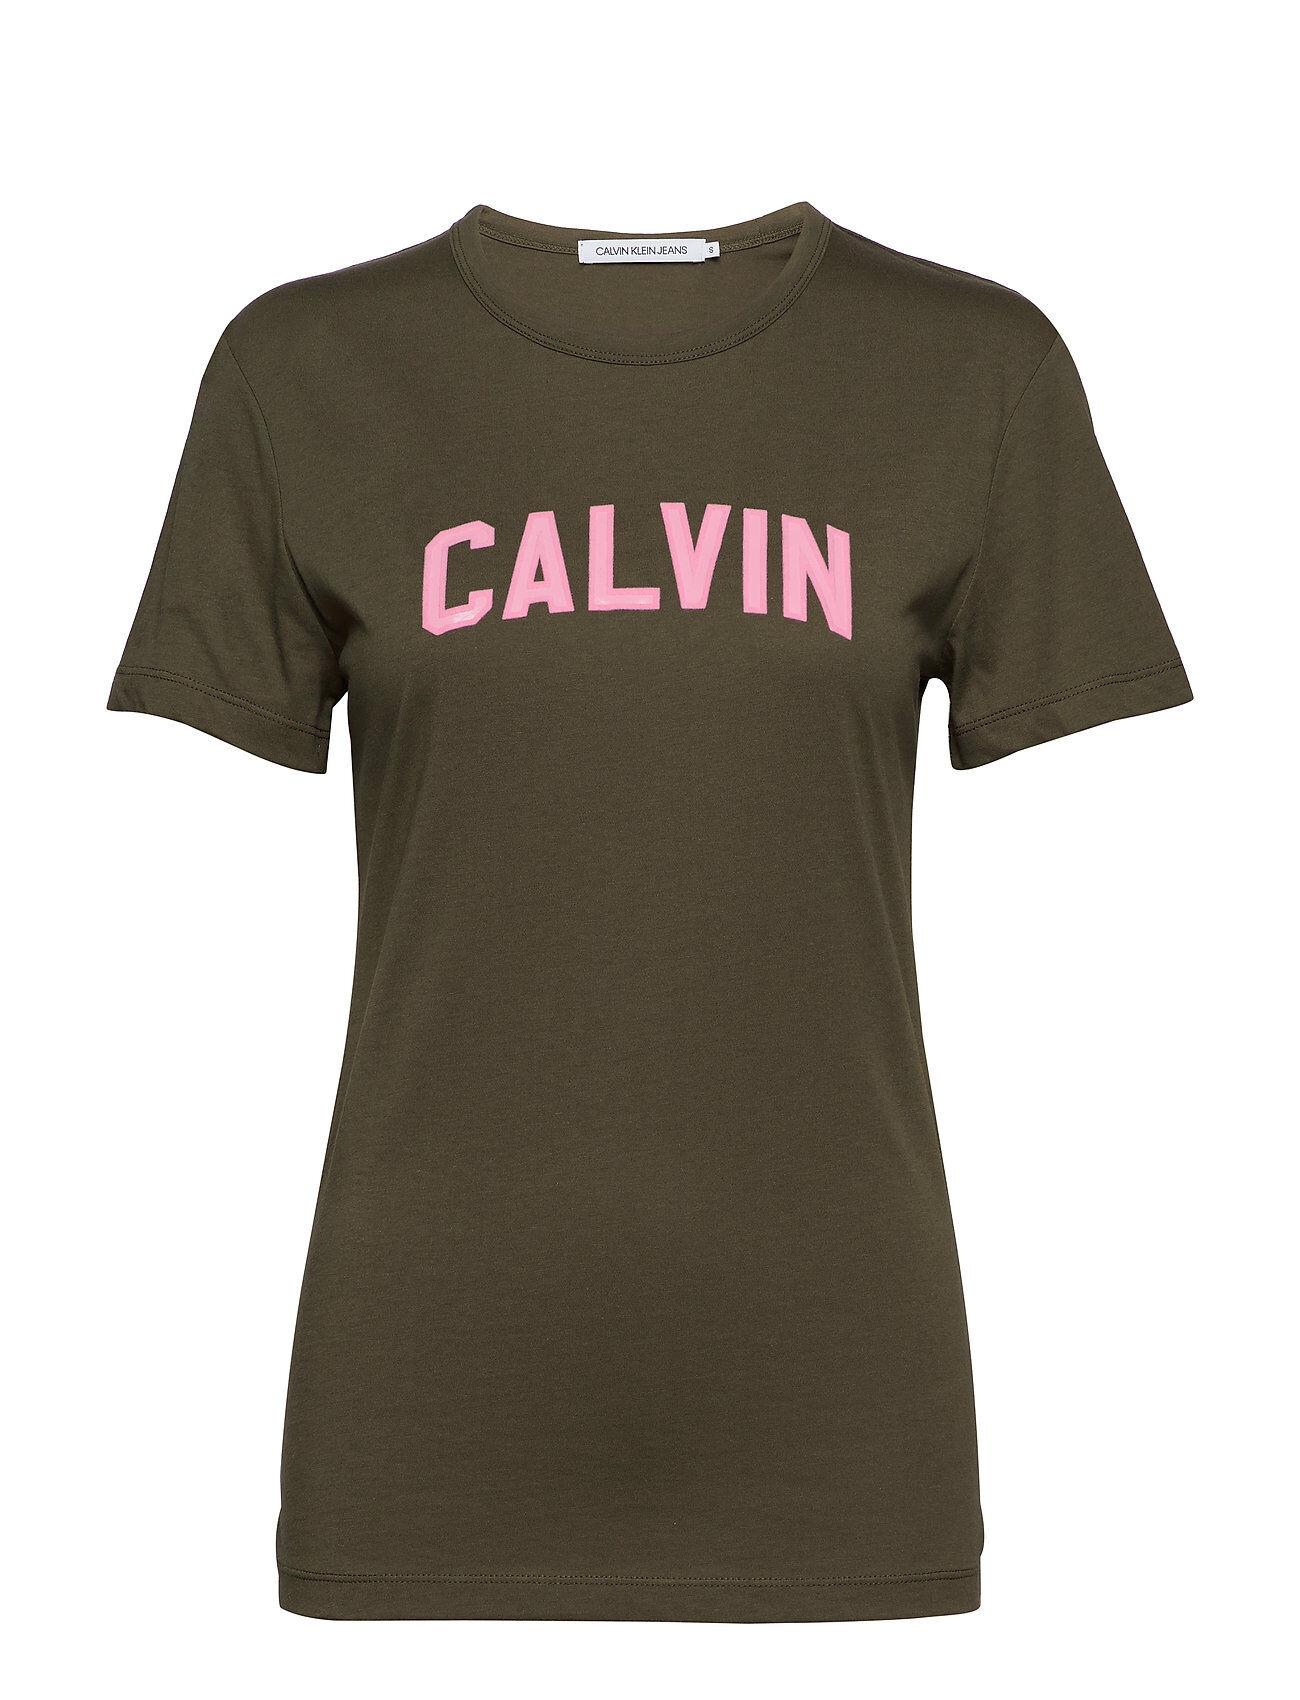 Image of Calvin Varsity Calvin Slim Tee T-shirts & Tops Short-sleeved Vihreä Calvin Klein Jeans